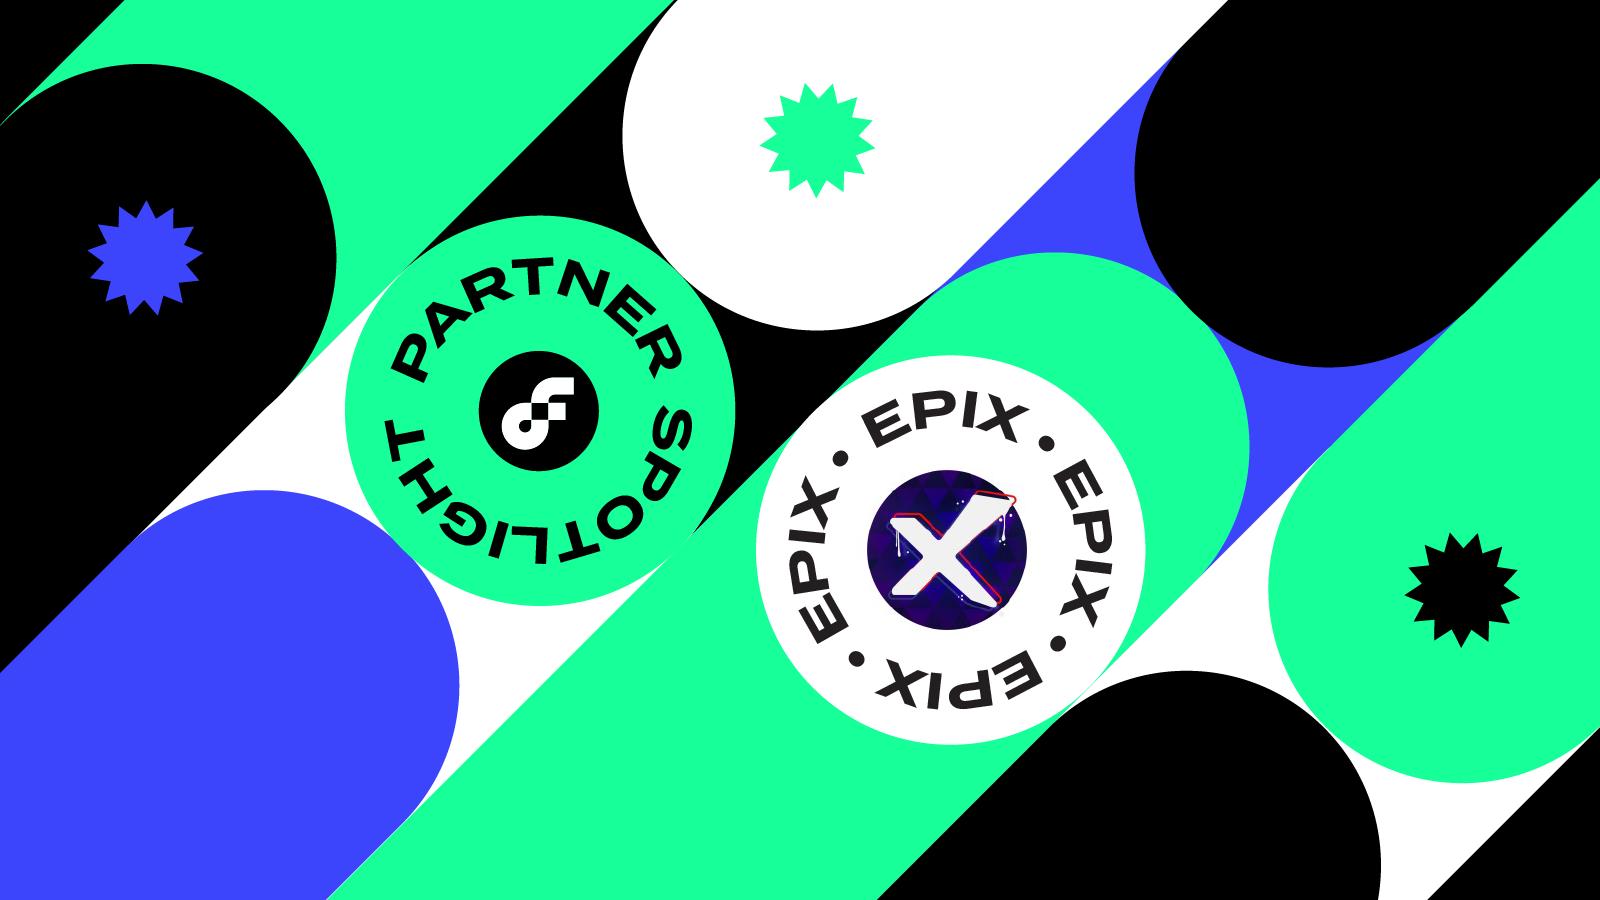 Partner Spotlight: Epix - NFT Platform to Power Them All